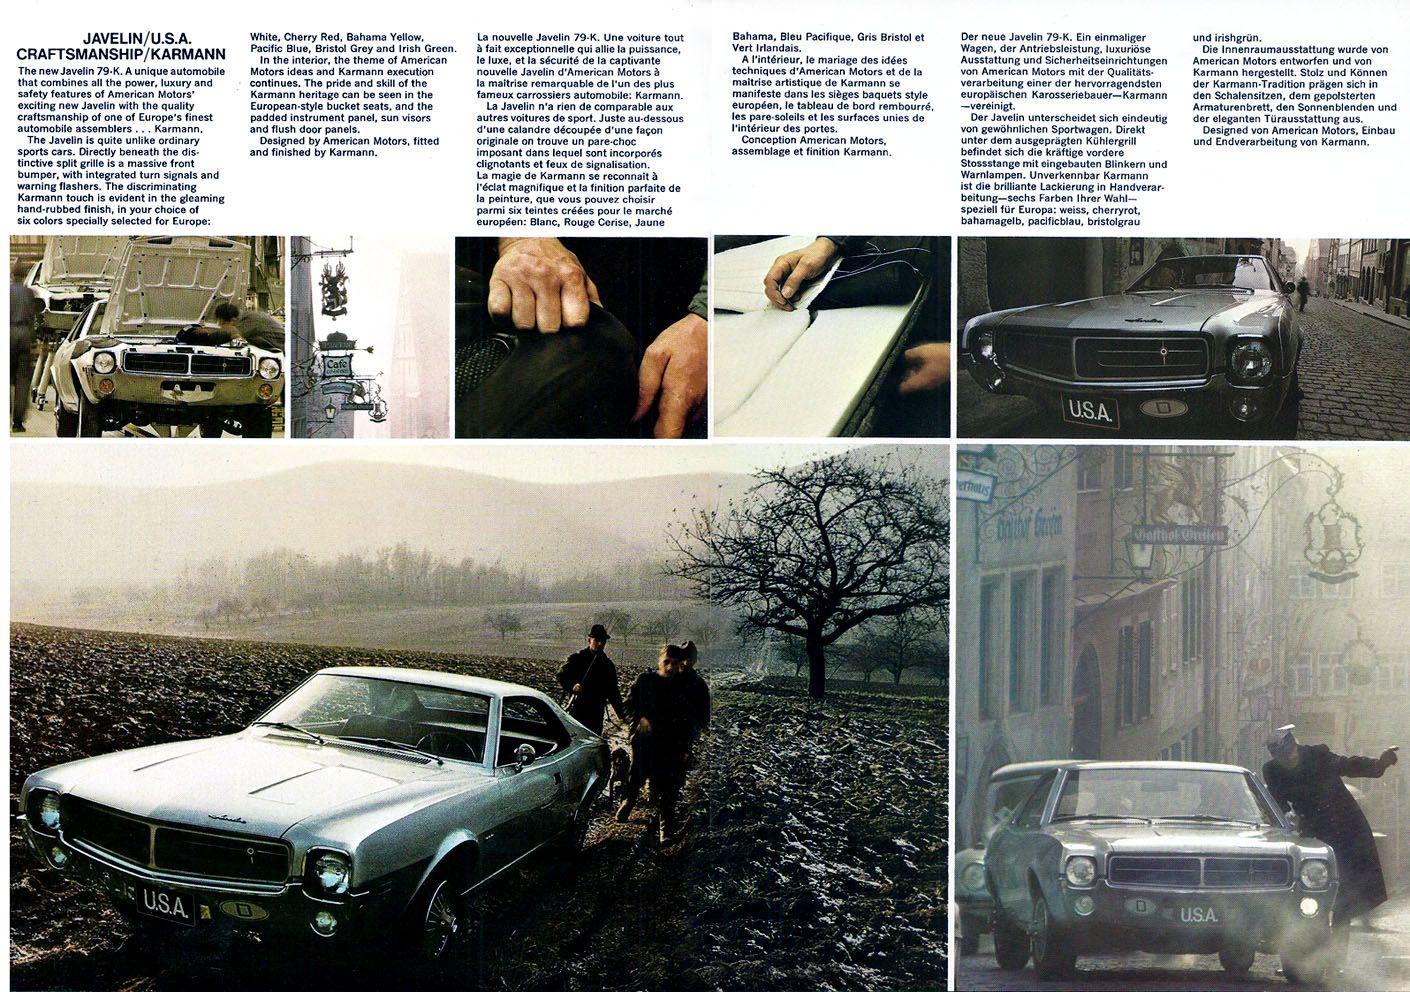 1969 Javelin Karmann Muscle Car Ads Amc Javelin Pony Car